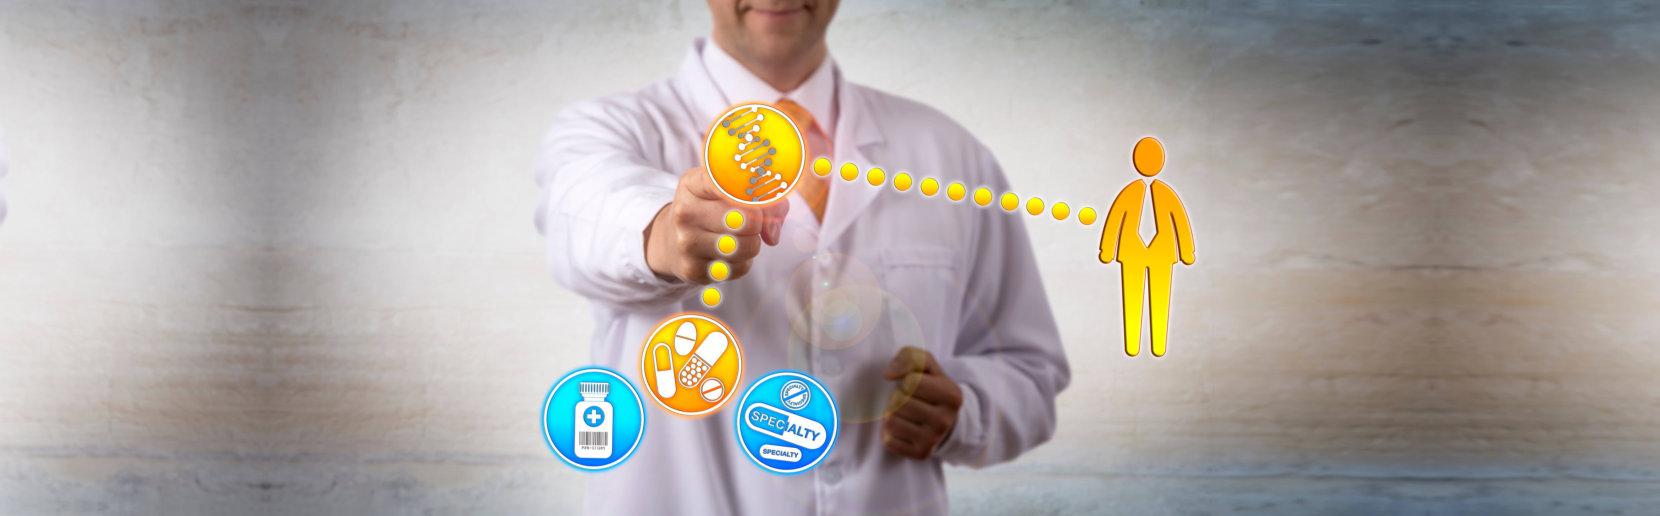 phramacist showing vector illustration of how medicines work